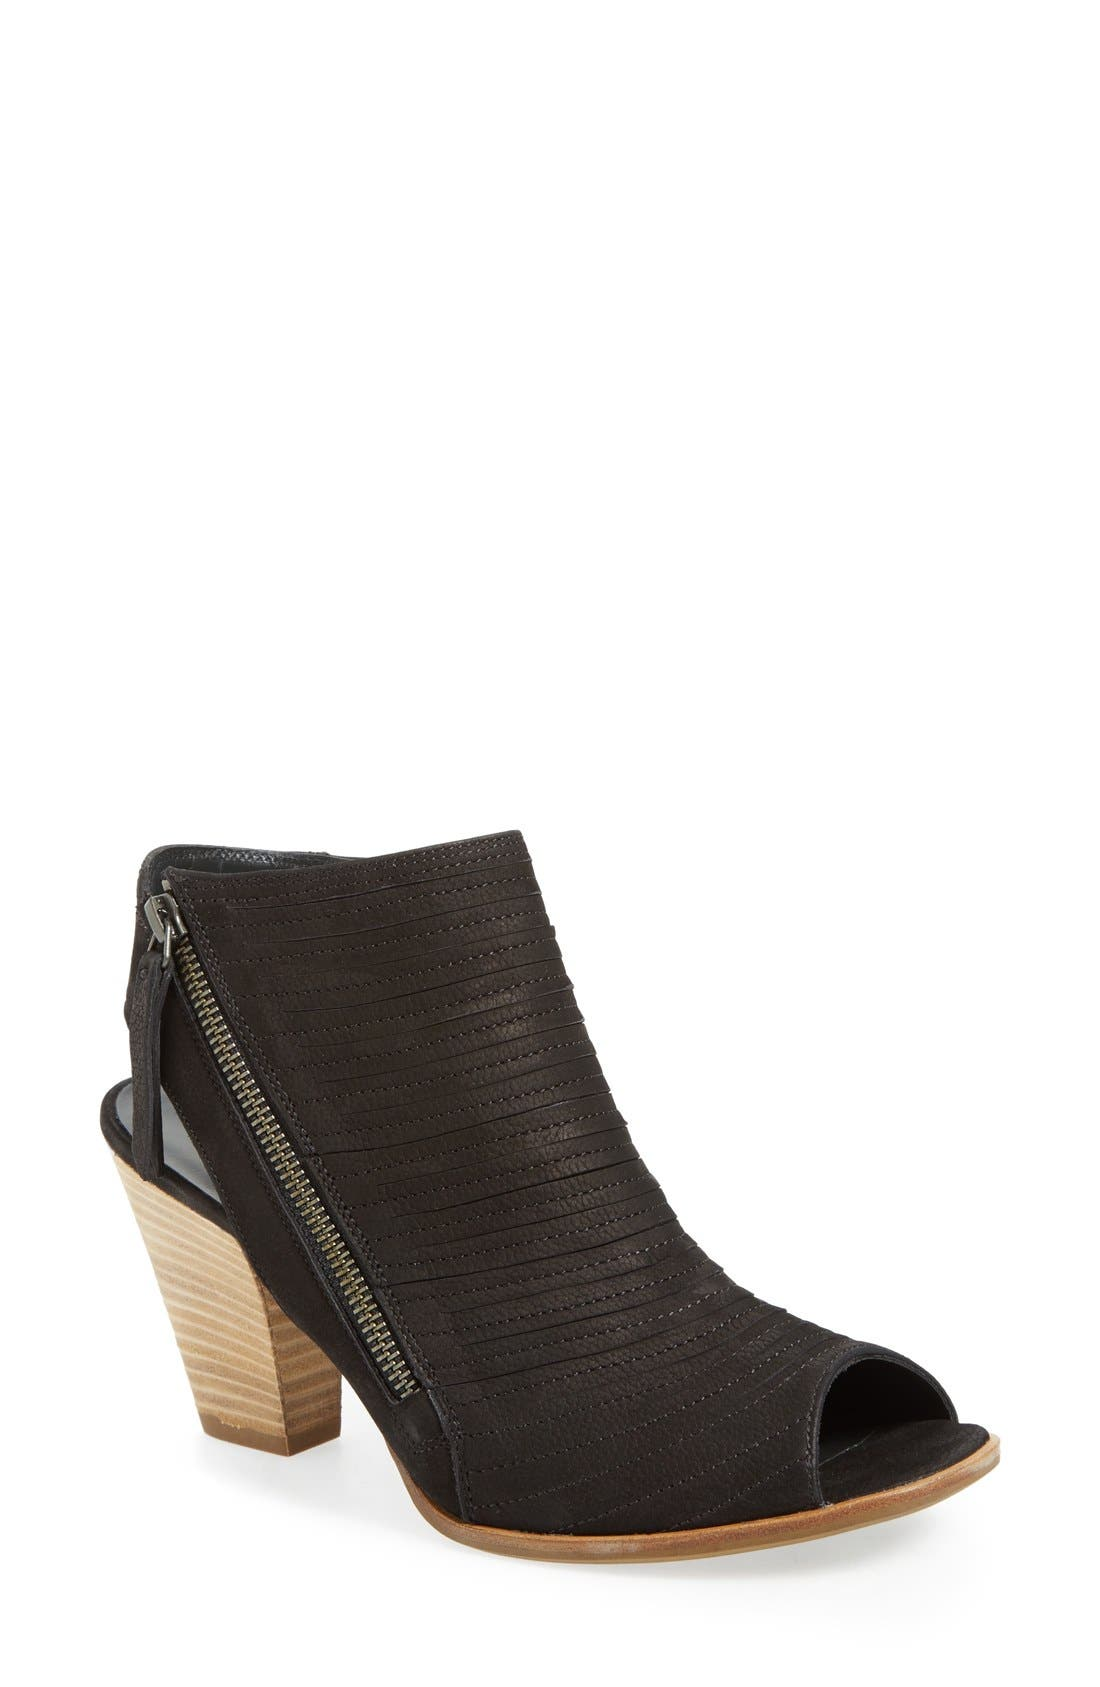 Main Image - Paul Green 'Cayanne' Leather Peep Toe Sandal (Women)